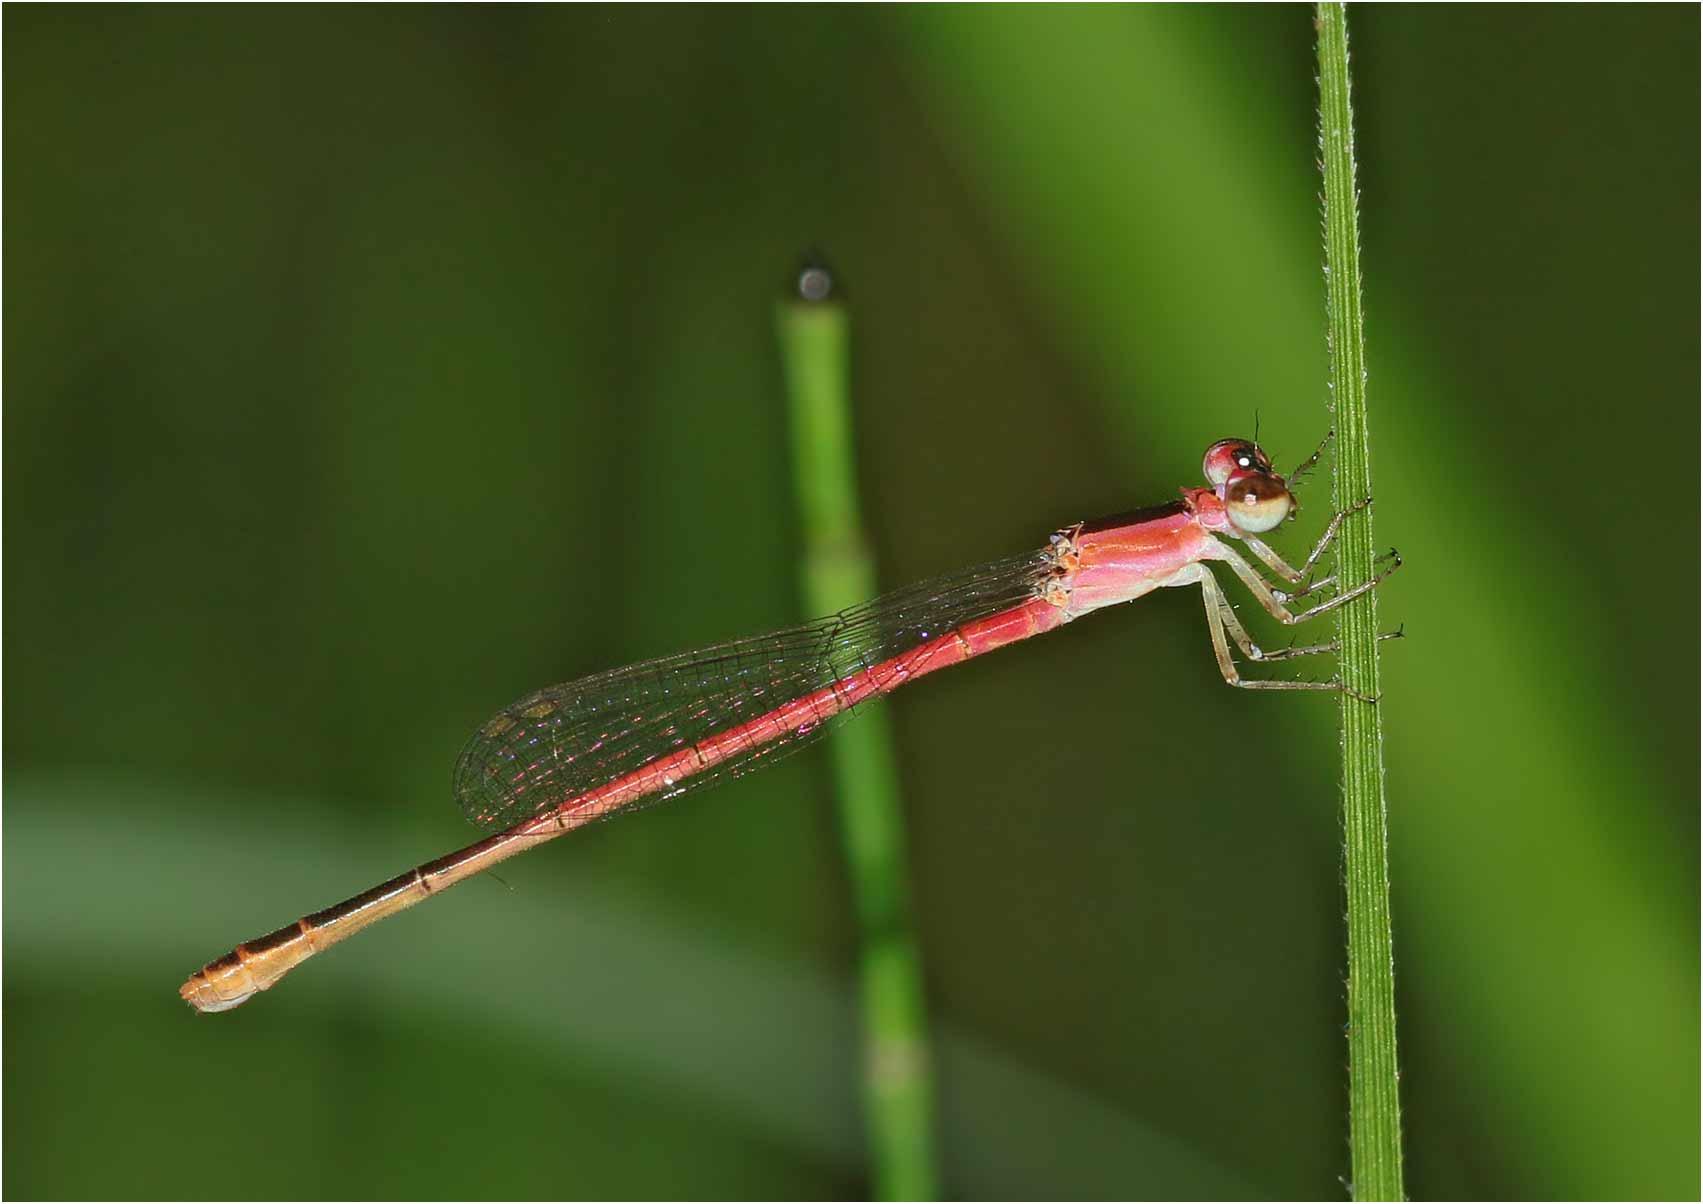 Agriocnemis femina femelle, Vietnam, Cuc Phong, 13 juin 2018